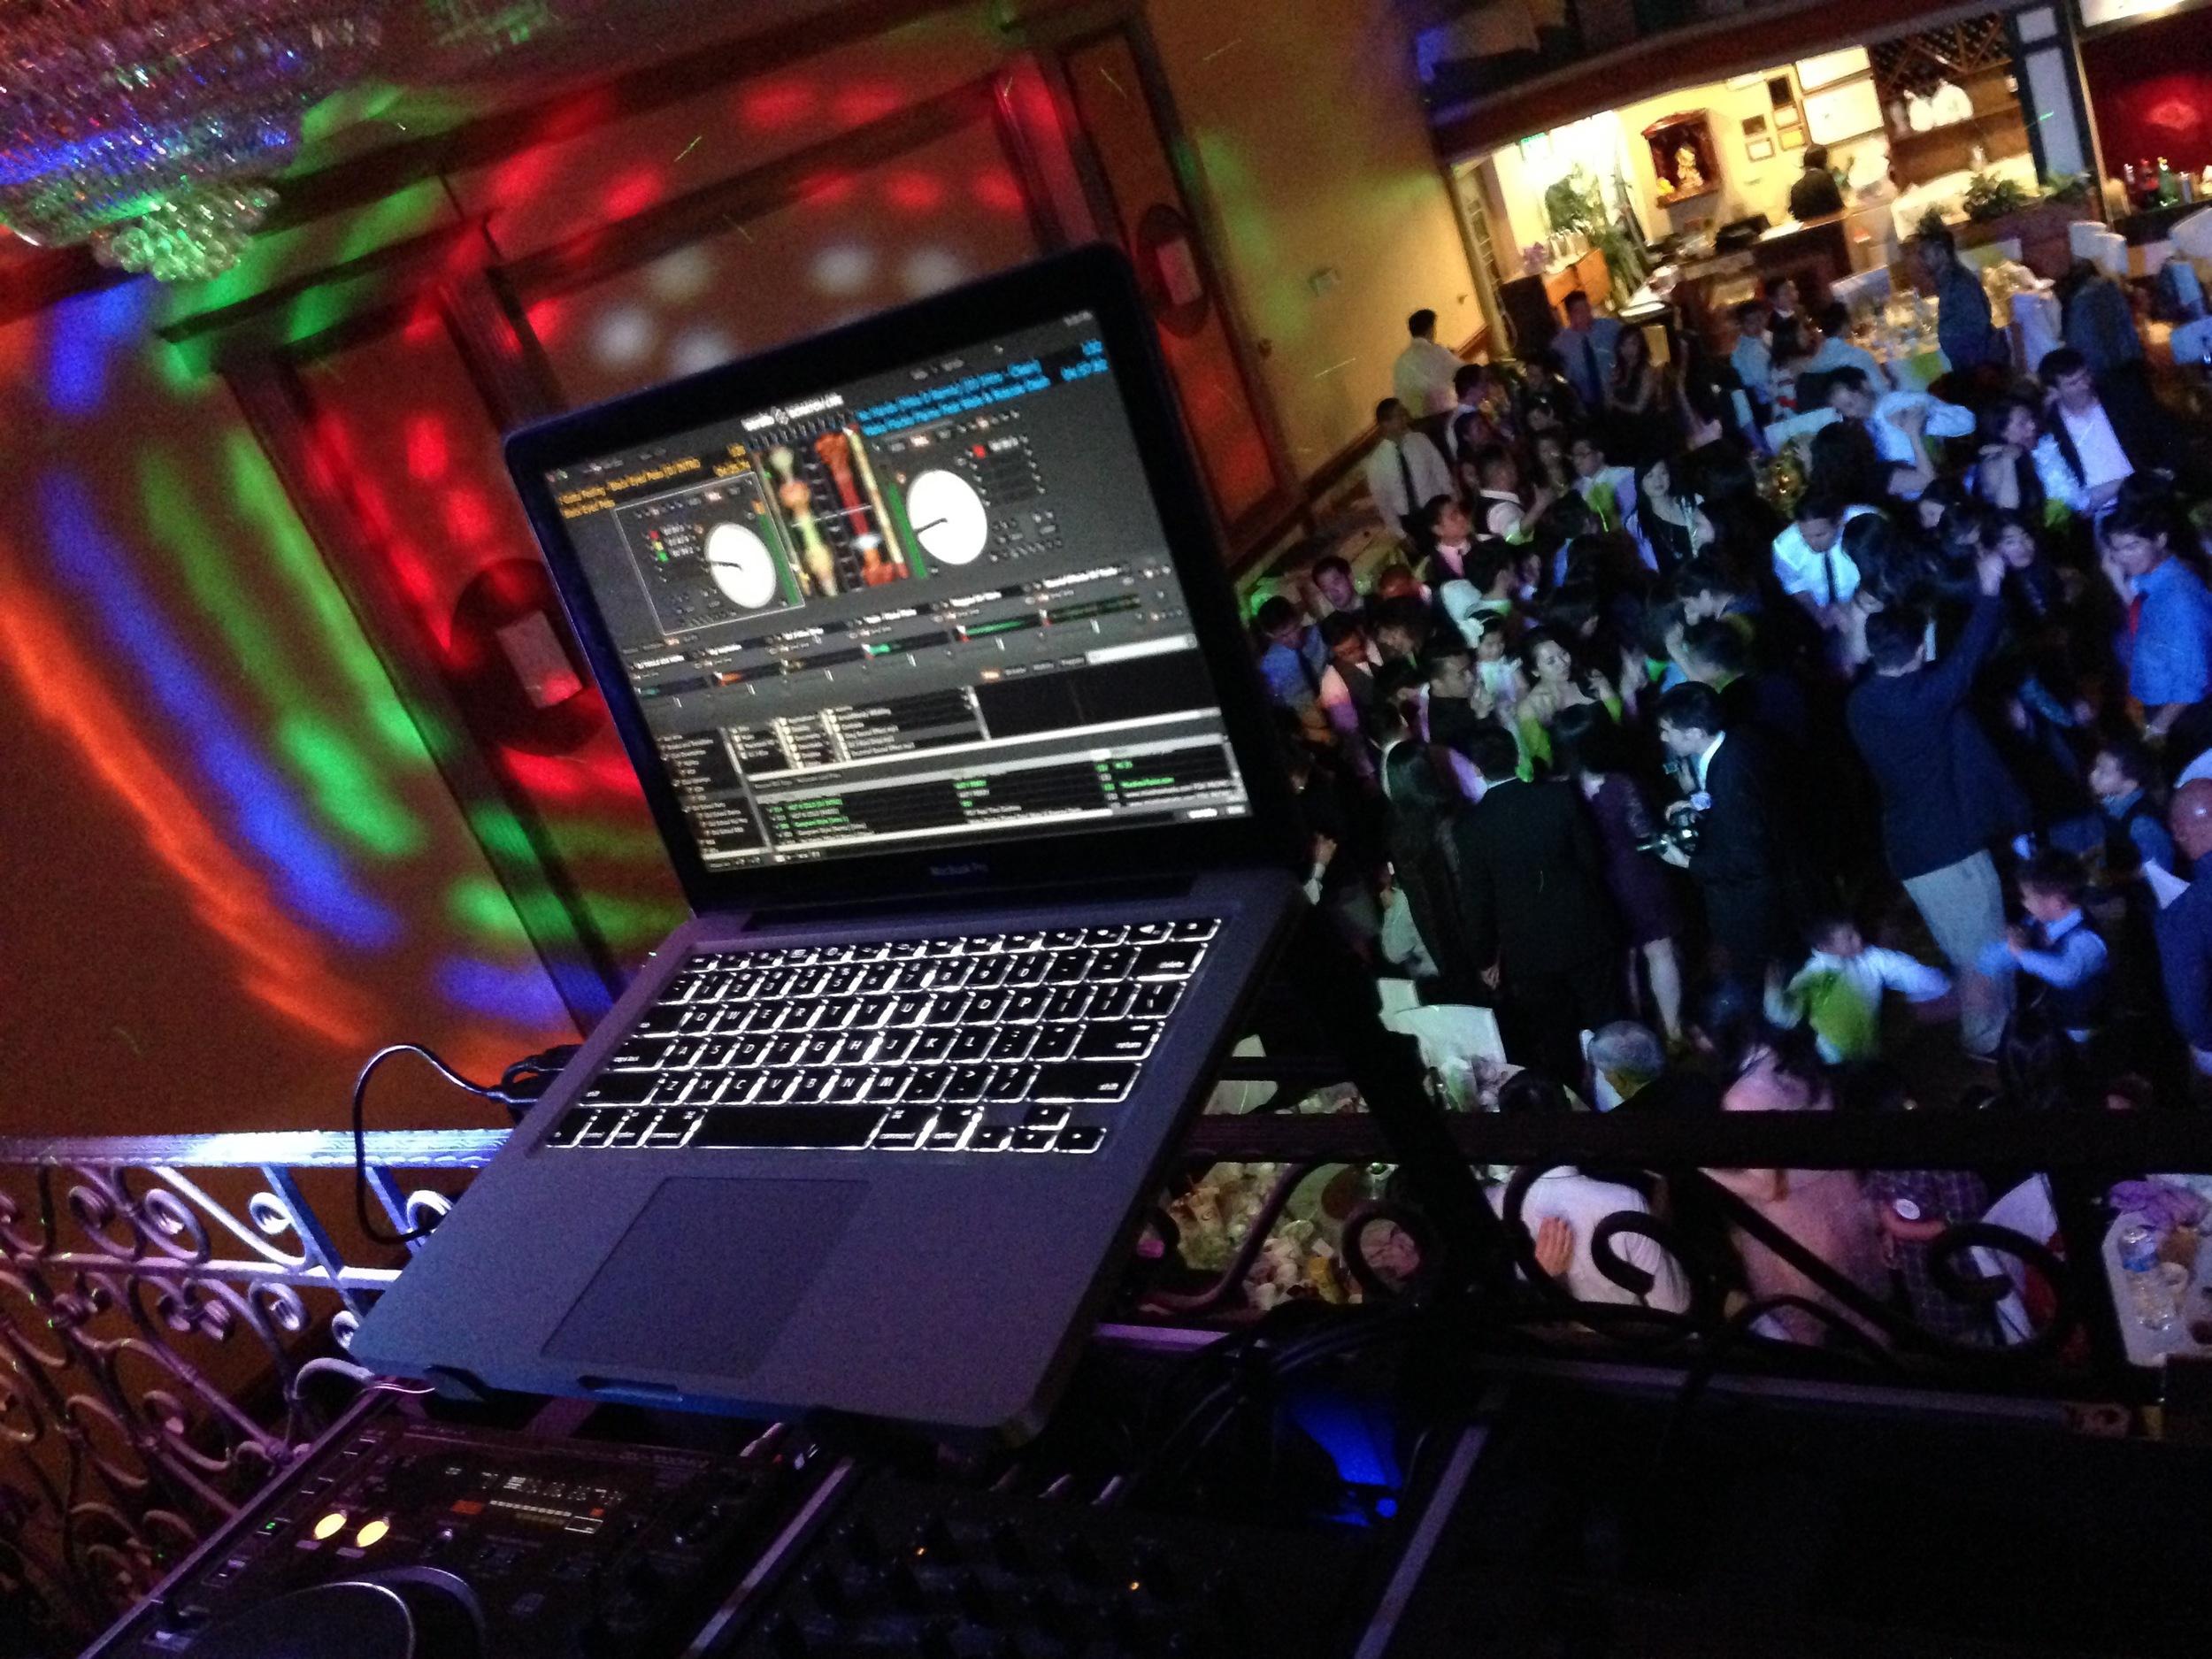 laptop_DJpic_kimmie4.jpg